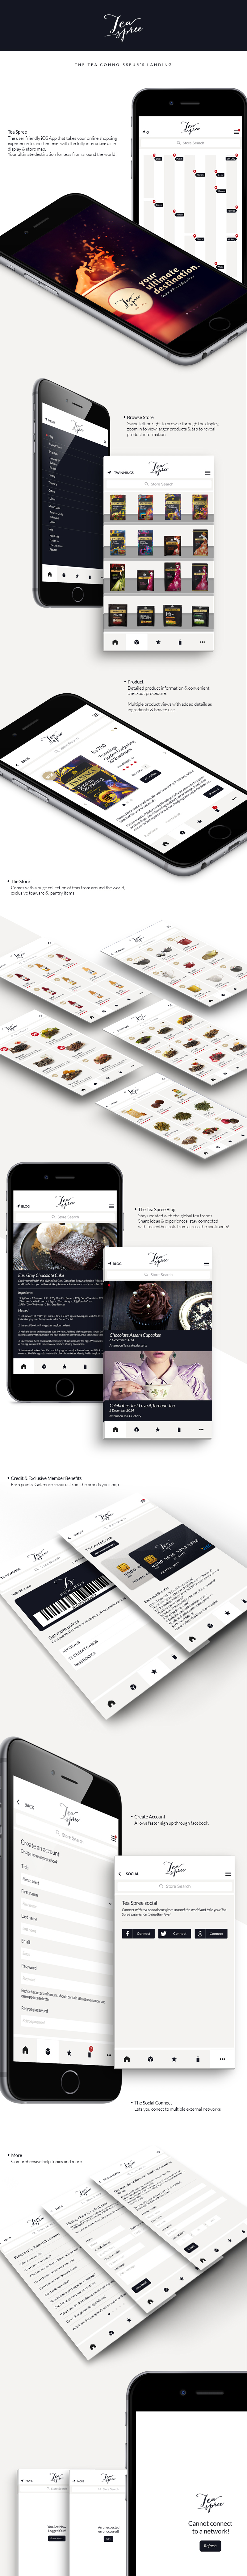 Tea Spree - The ultimate 'Tea Shopping' experience on Behance